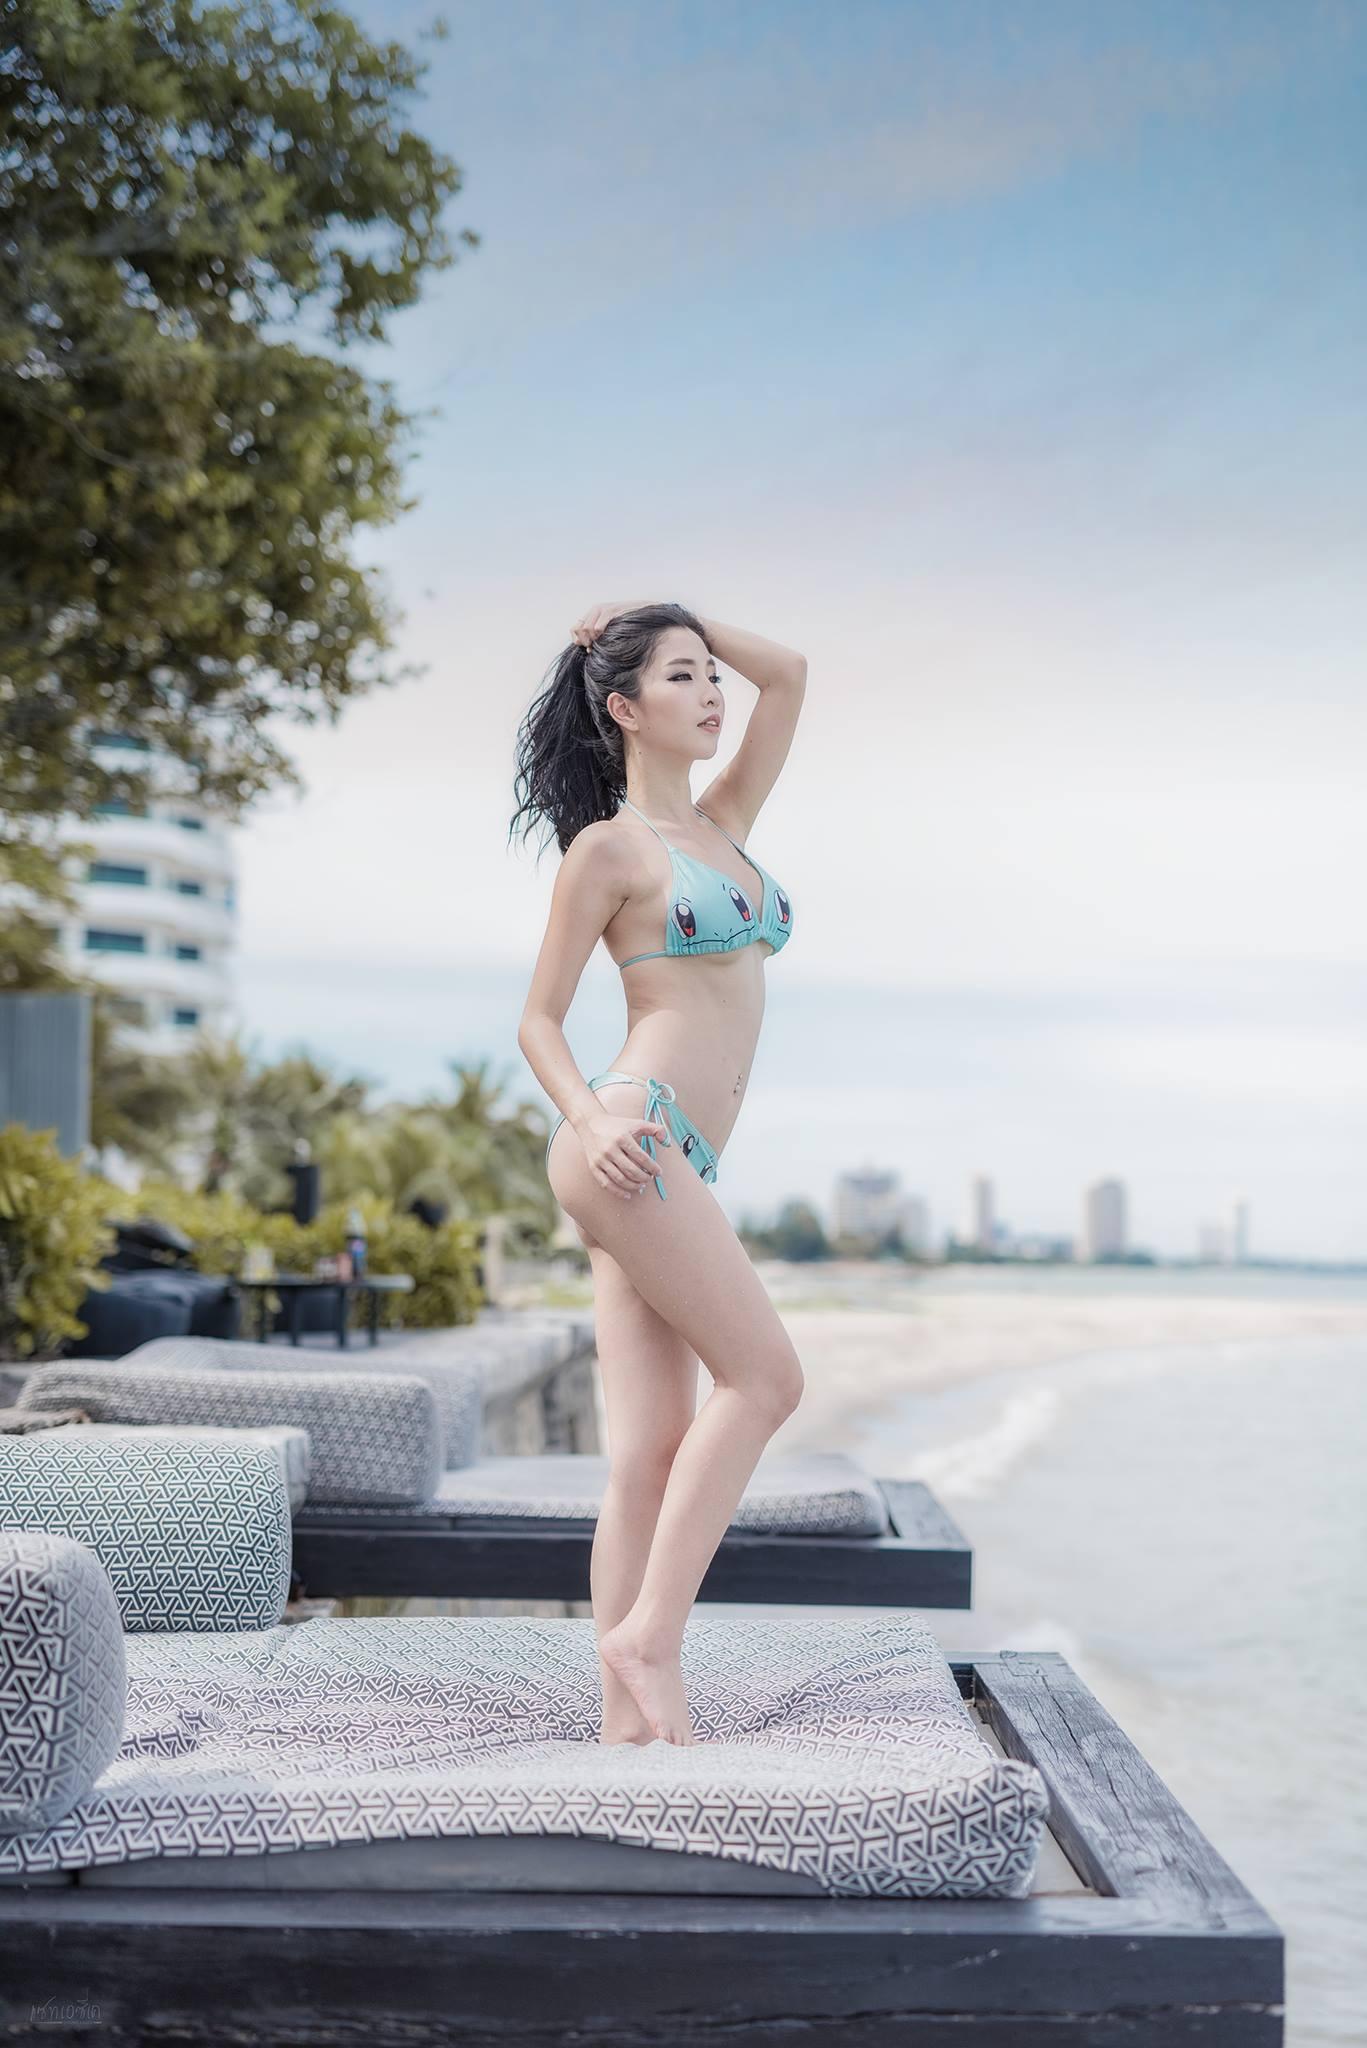 Ohly on Da Beach Part 2 - Atita Wittayakajohndet